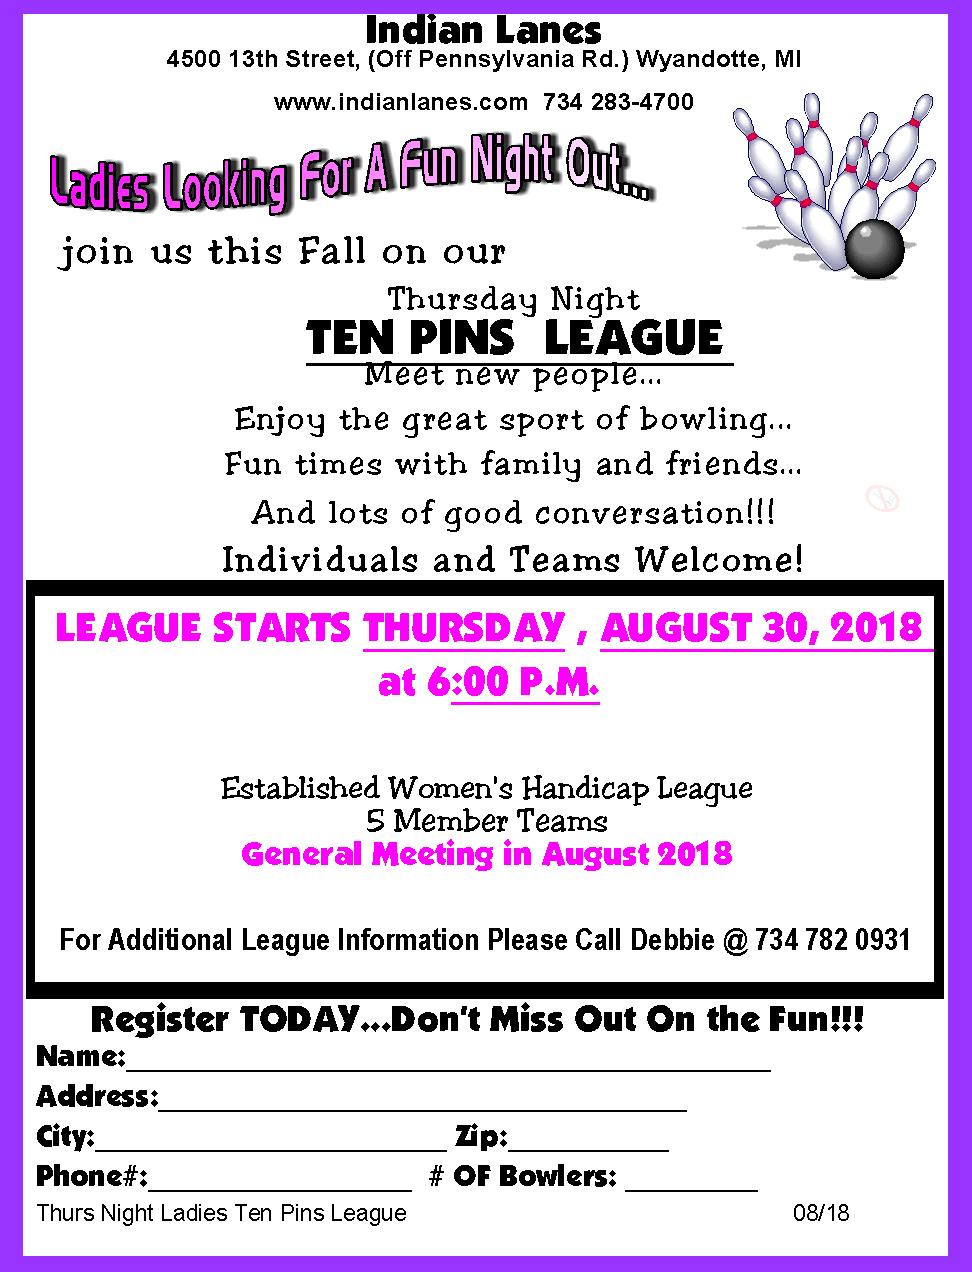 IL_Ladies_Thursday_Night_Ten_Pins_League